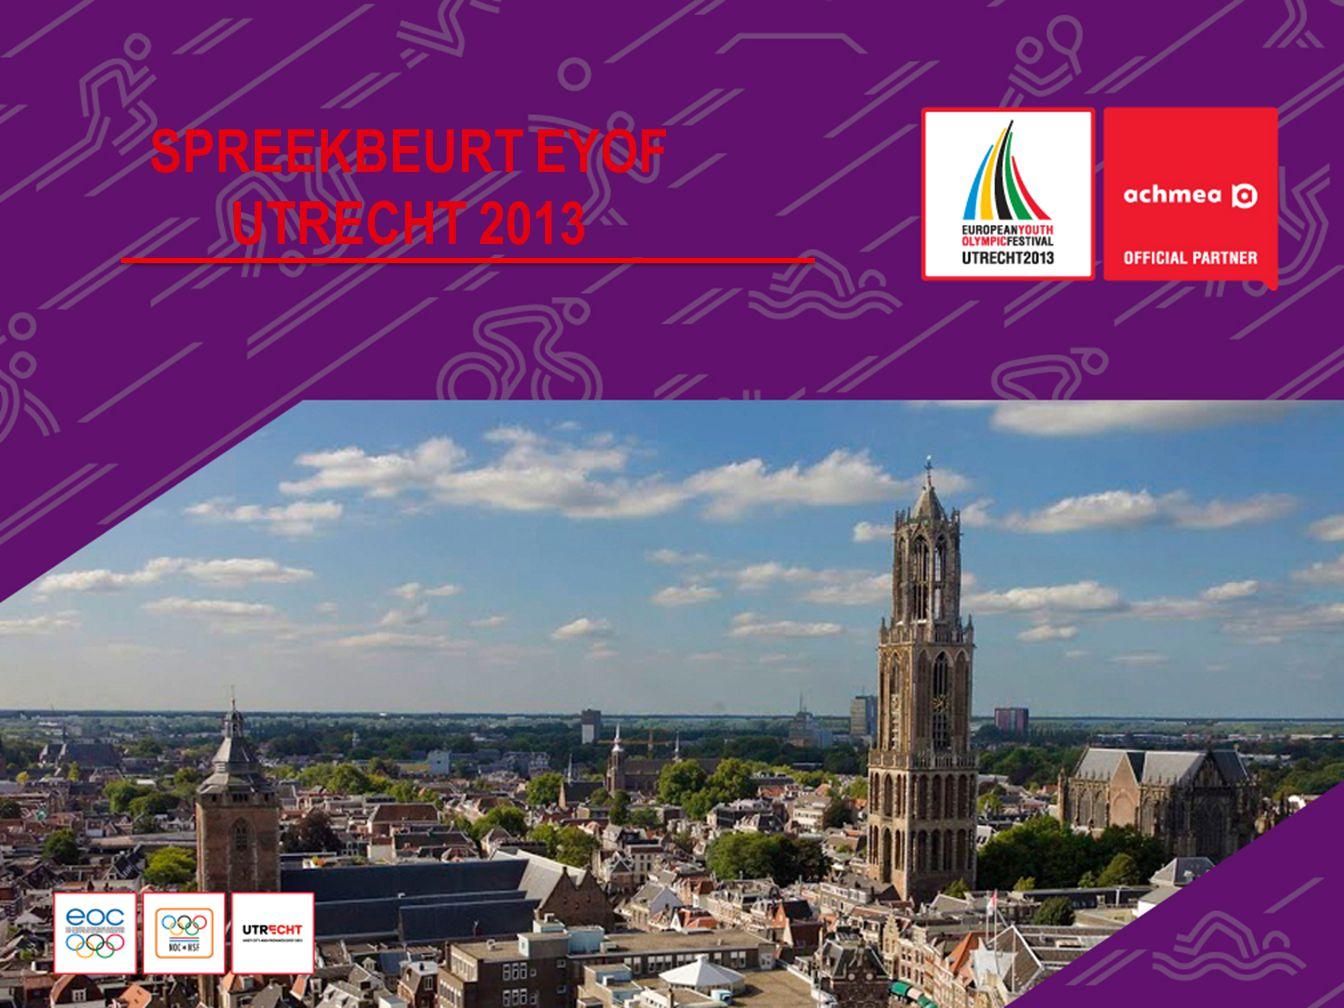 Spreekbeurt EYOF Utrecht 2013